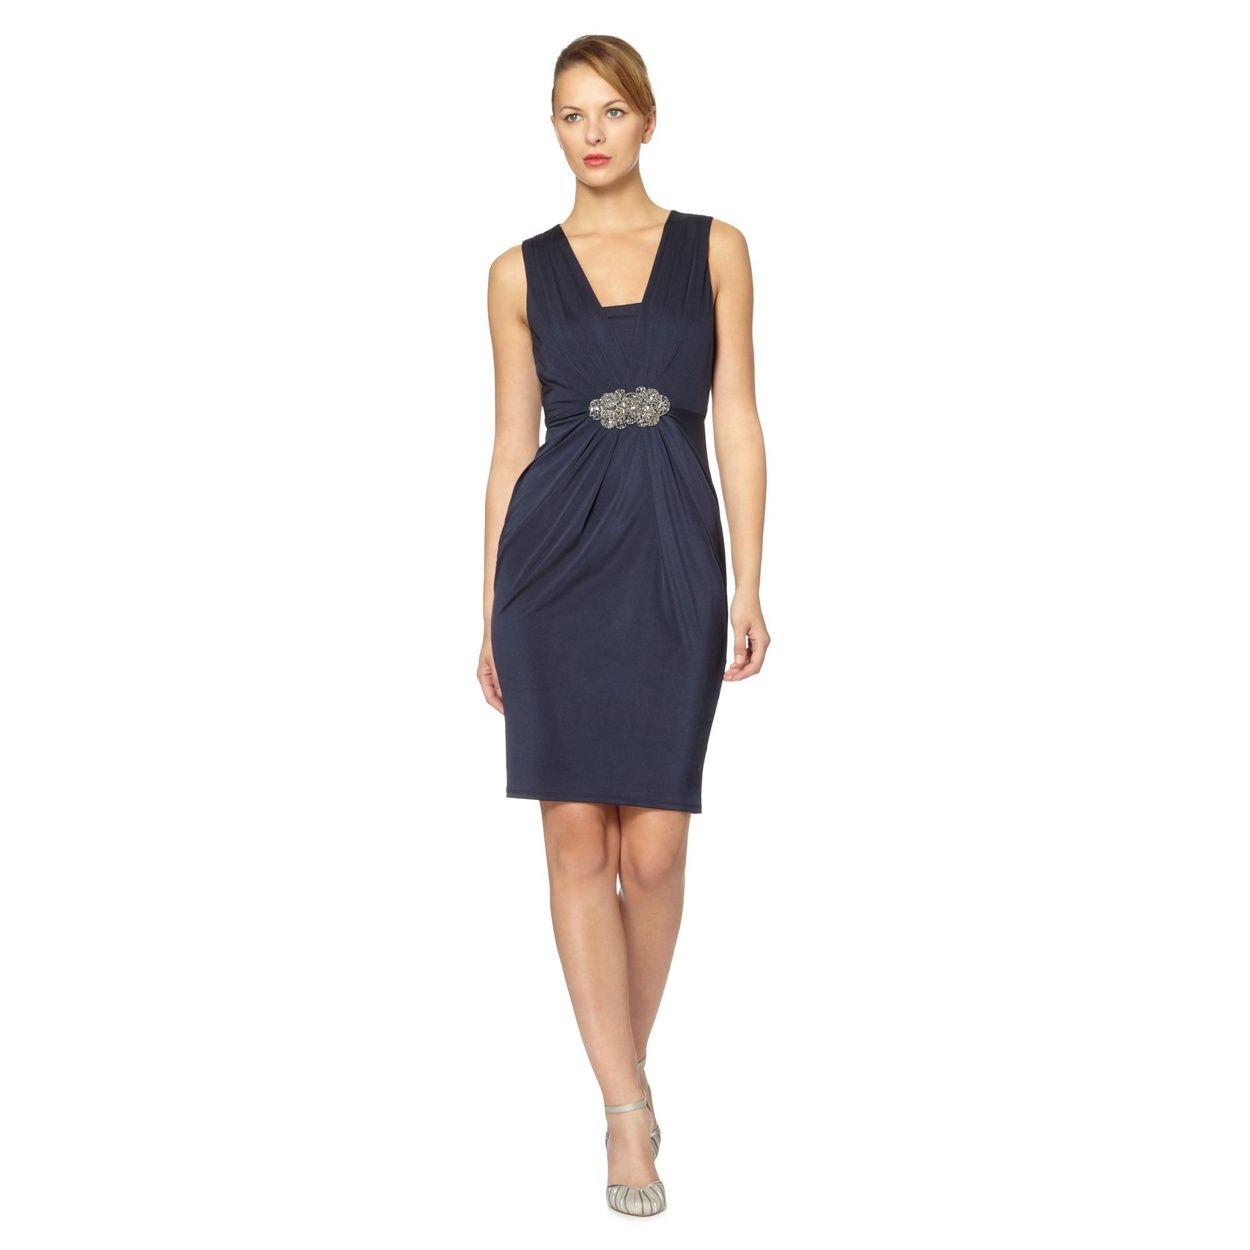 Black dress debenhams - Shift Dresses Dresses Women Debenhams